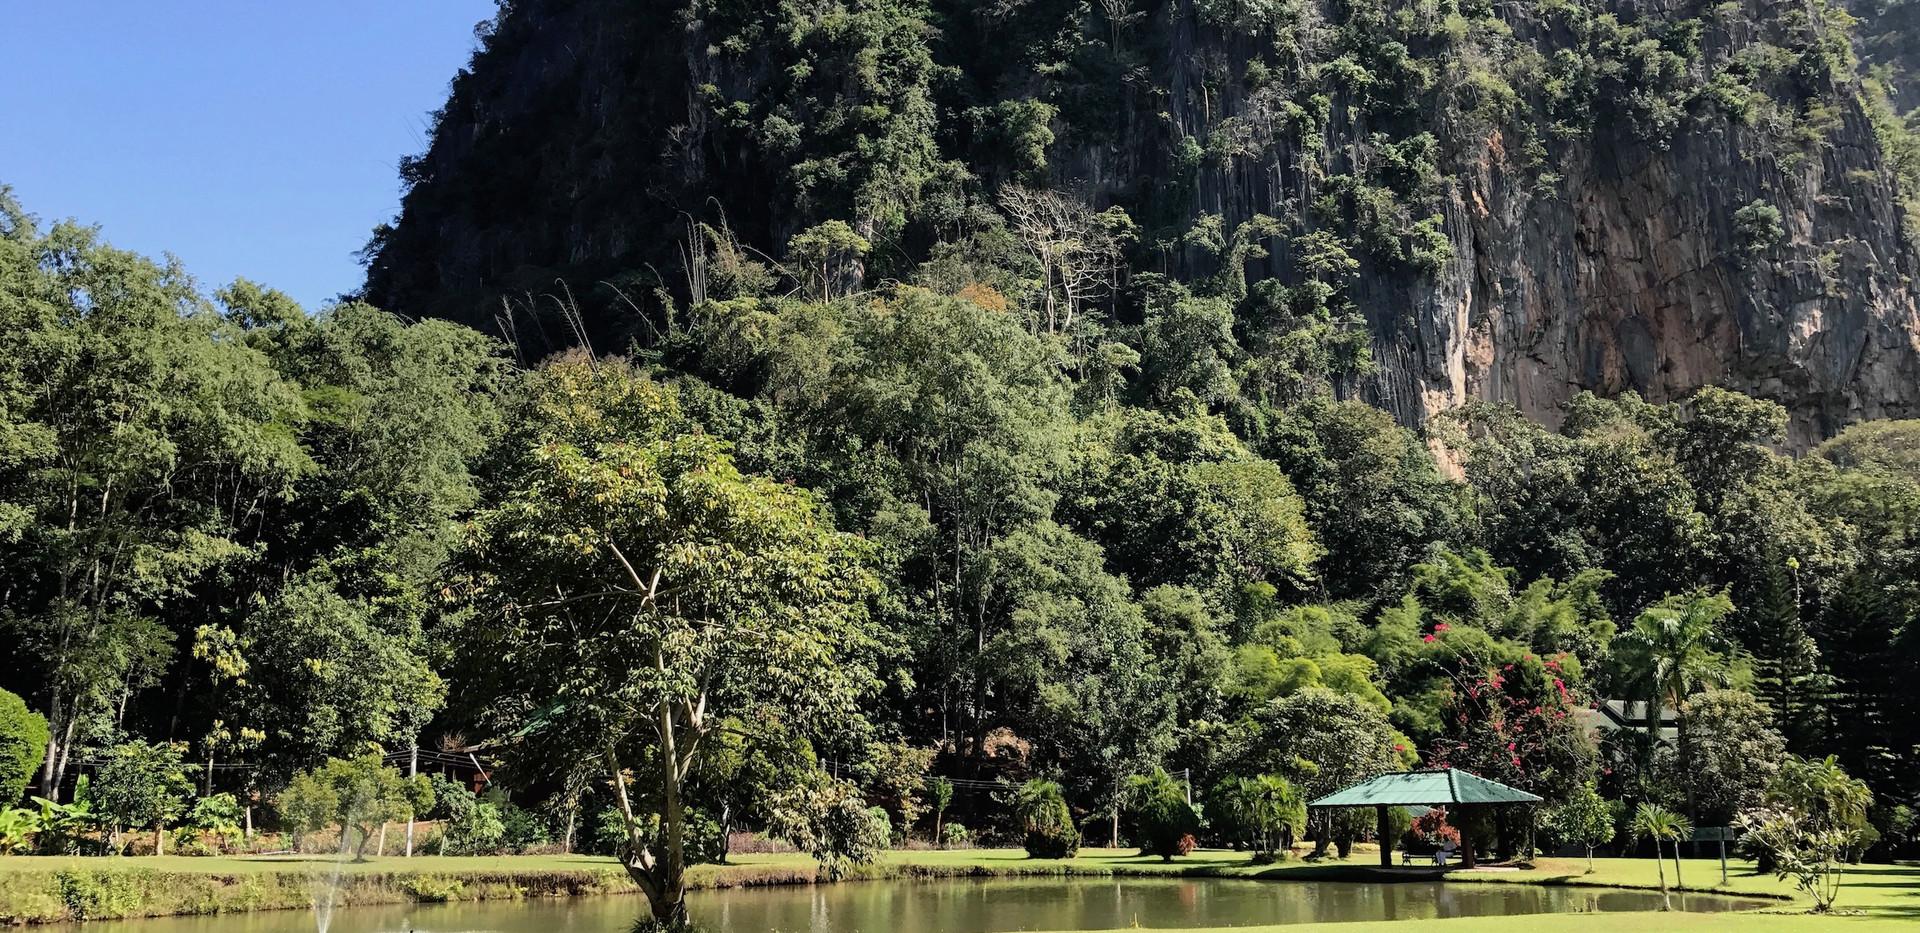 Thailand Yoga Holidays Destination Forest Meditation Center Pure Nature Surroundings